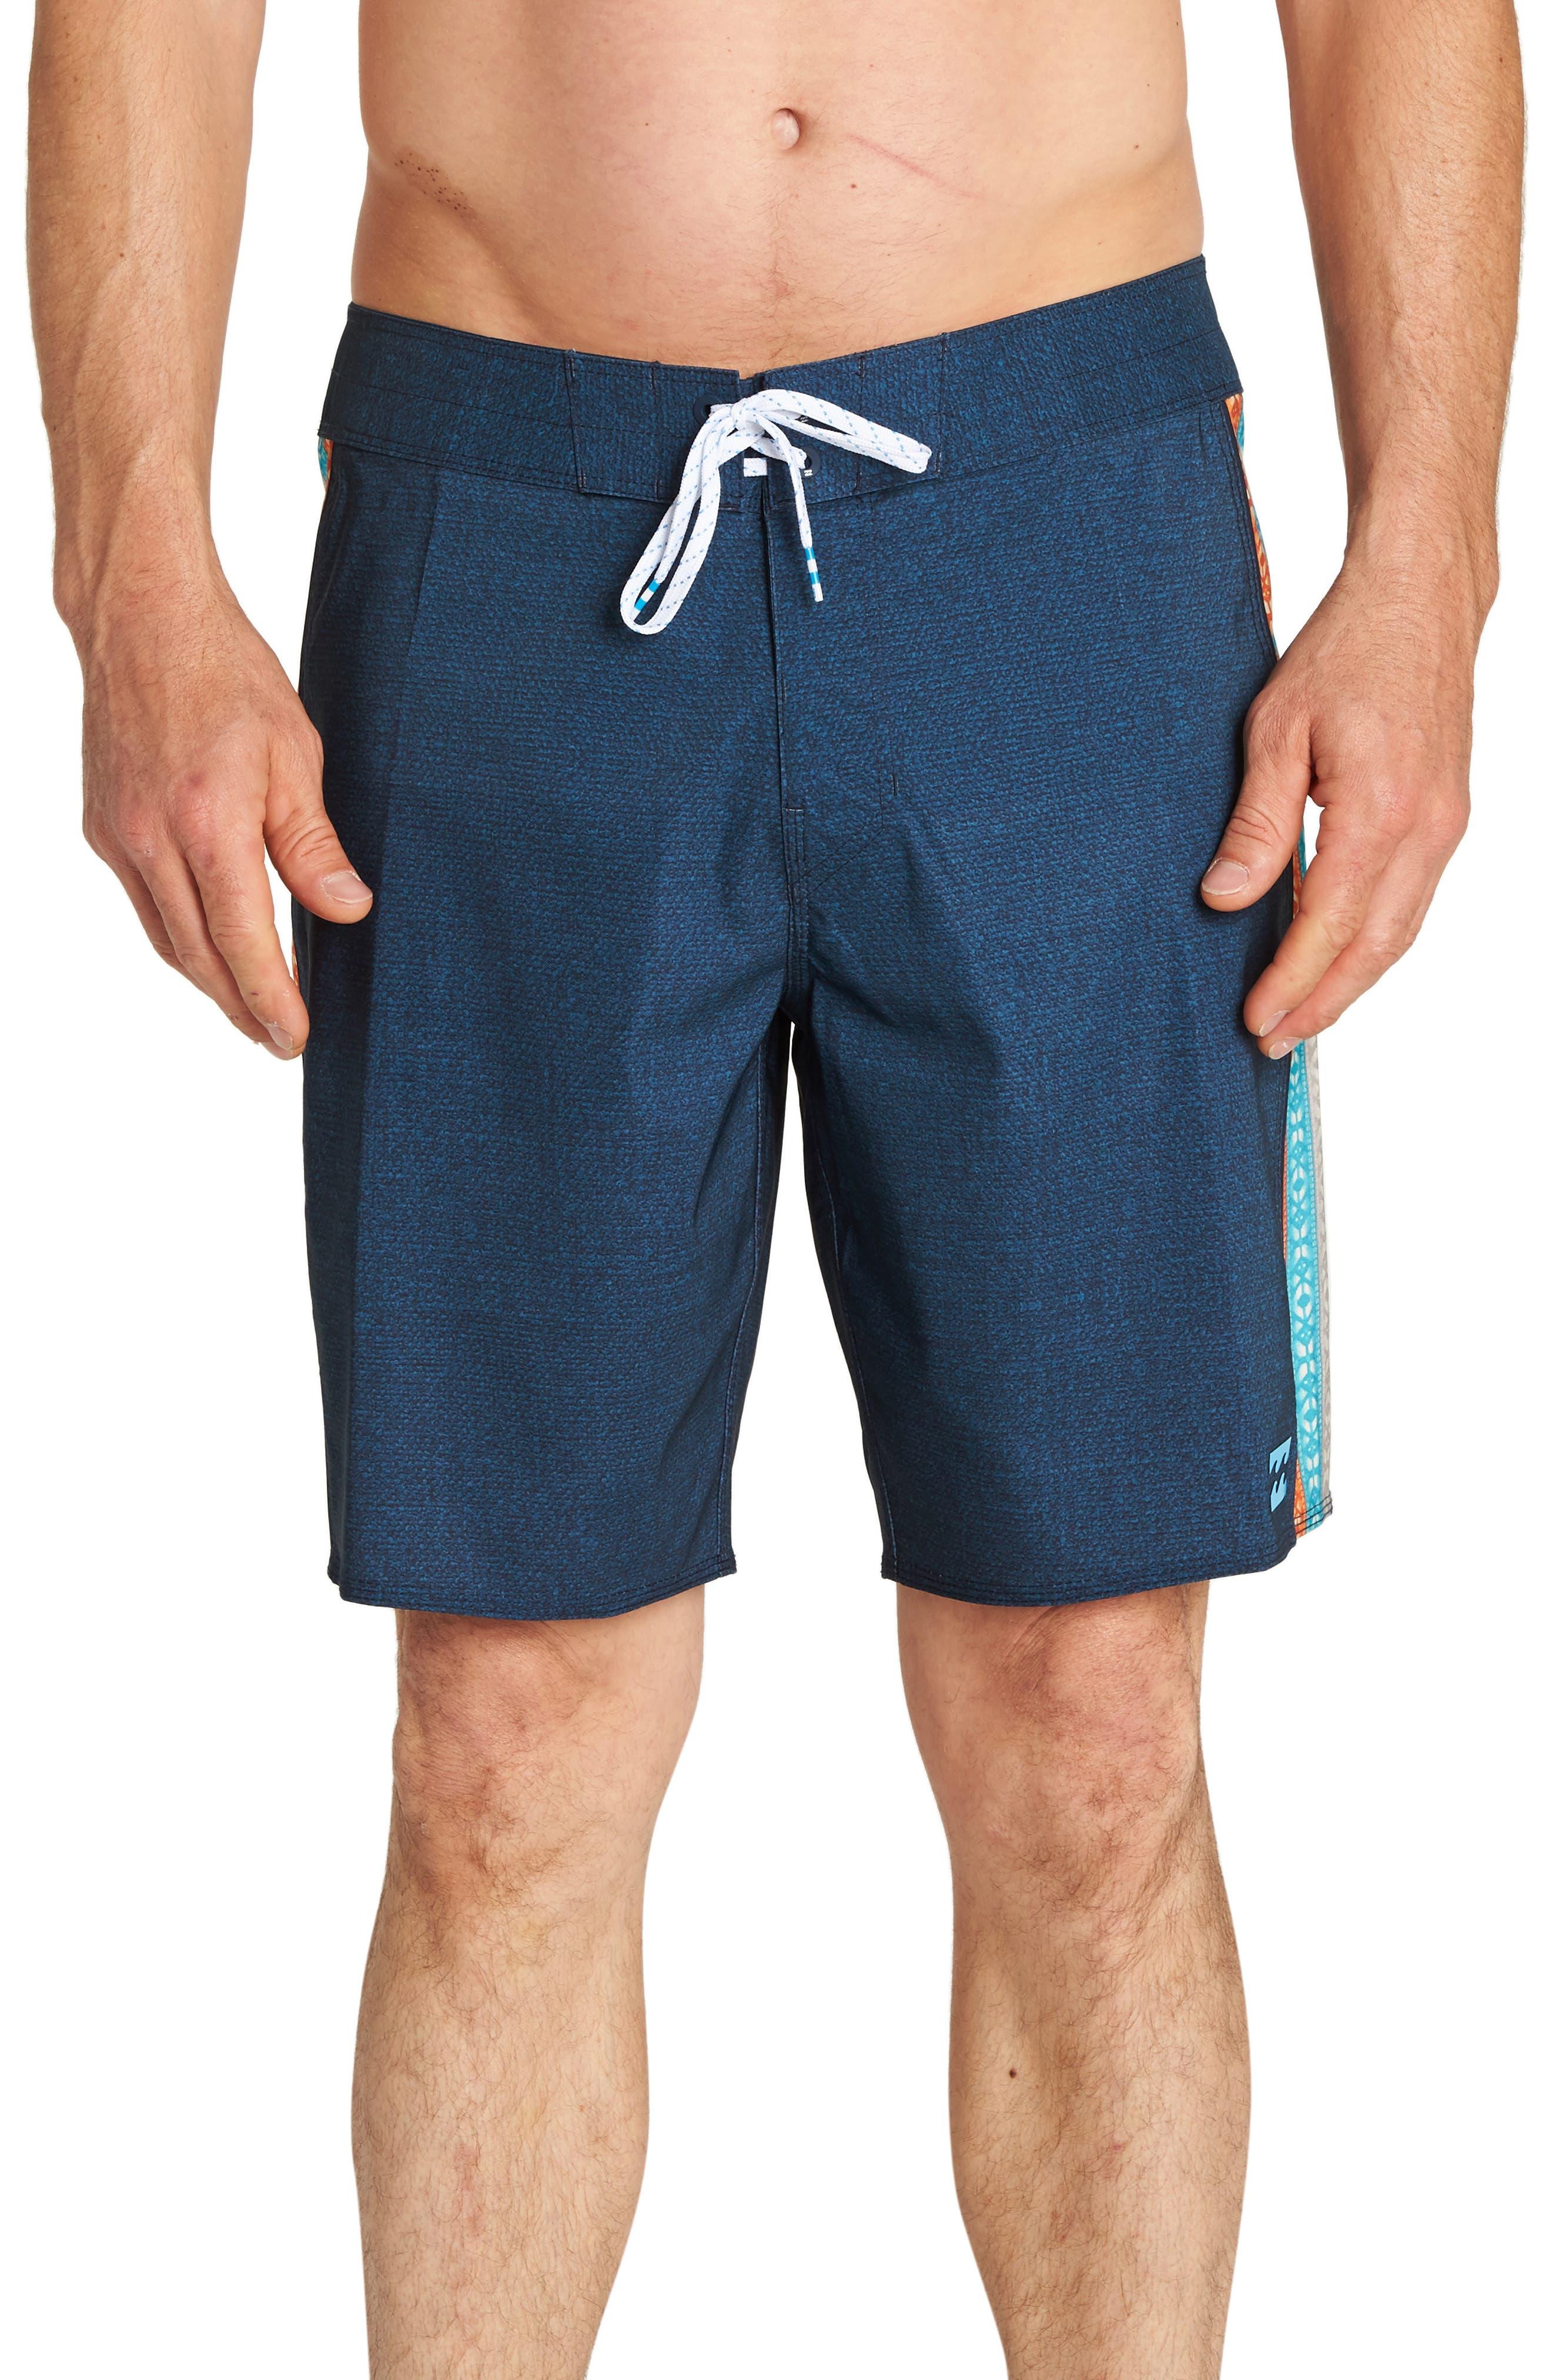 D Bah Airlite Board Shorts,                             Main thumbnail 4, color,